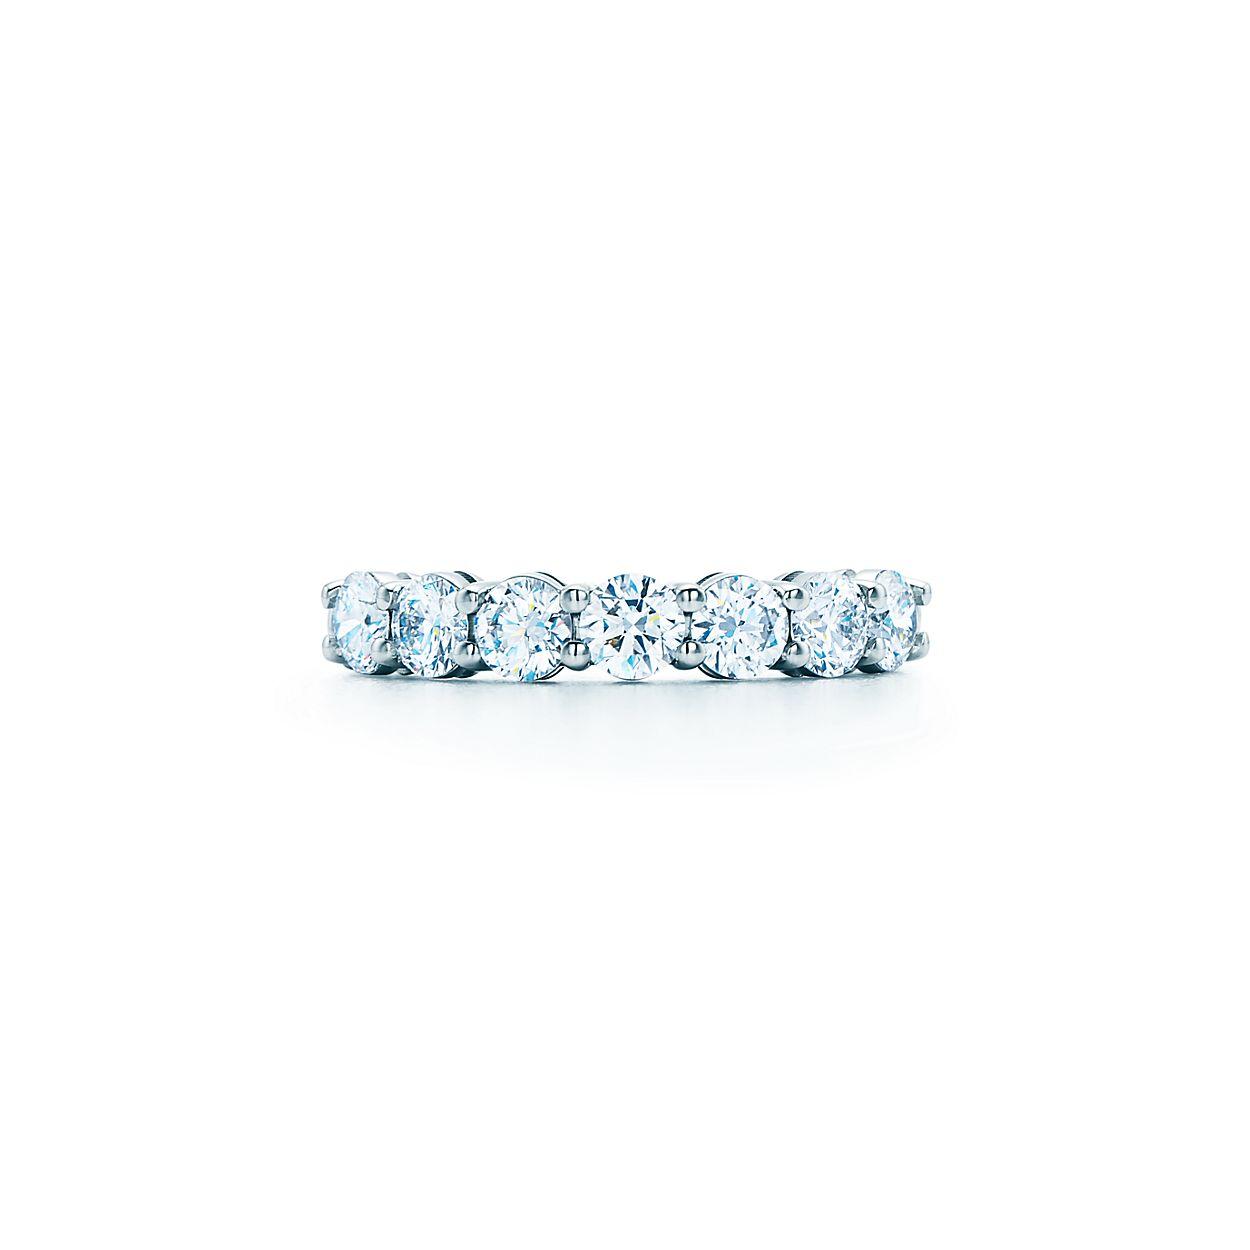 Tiffany wedding band in platinum, 3 mm wide - Size 4 1/2 Tiffany & Co.